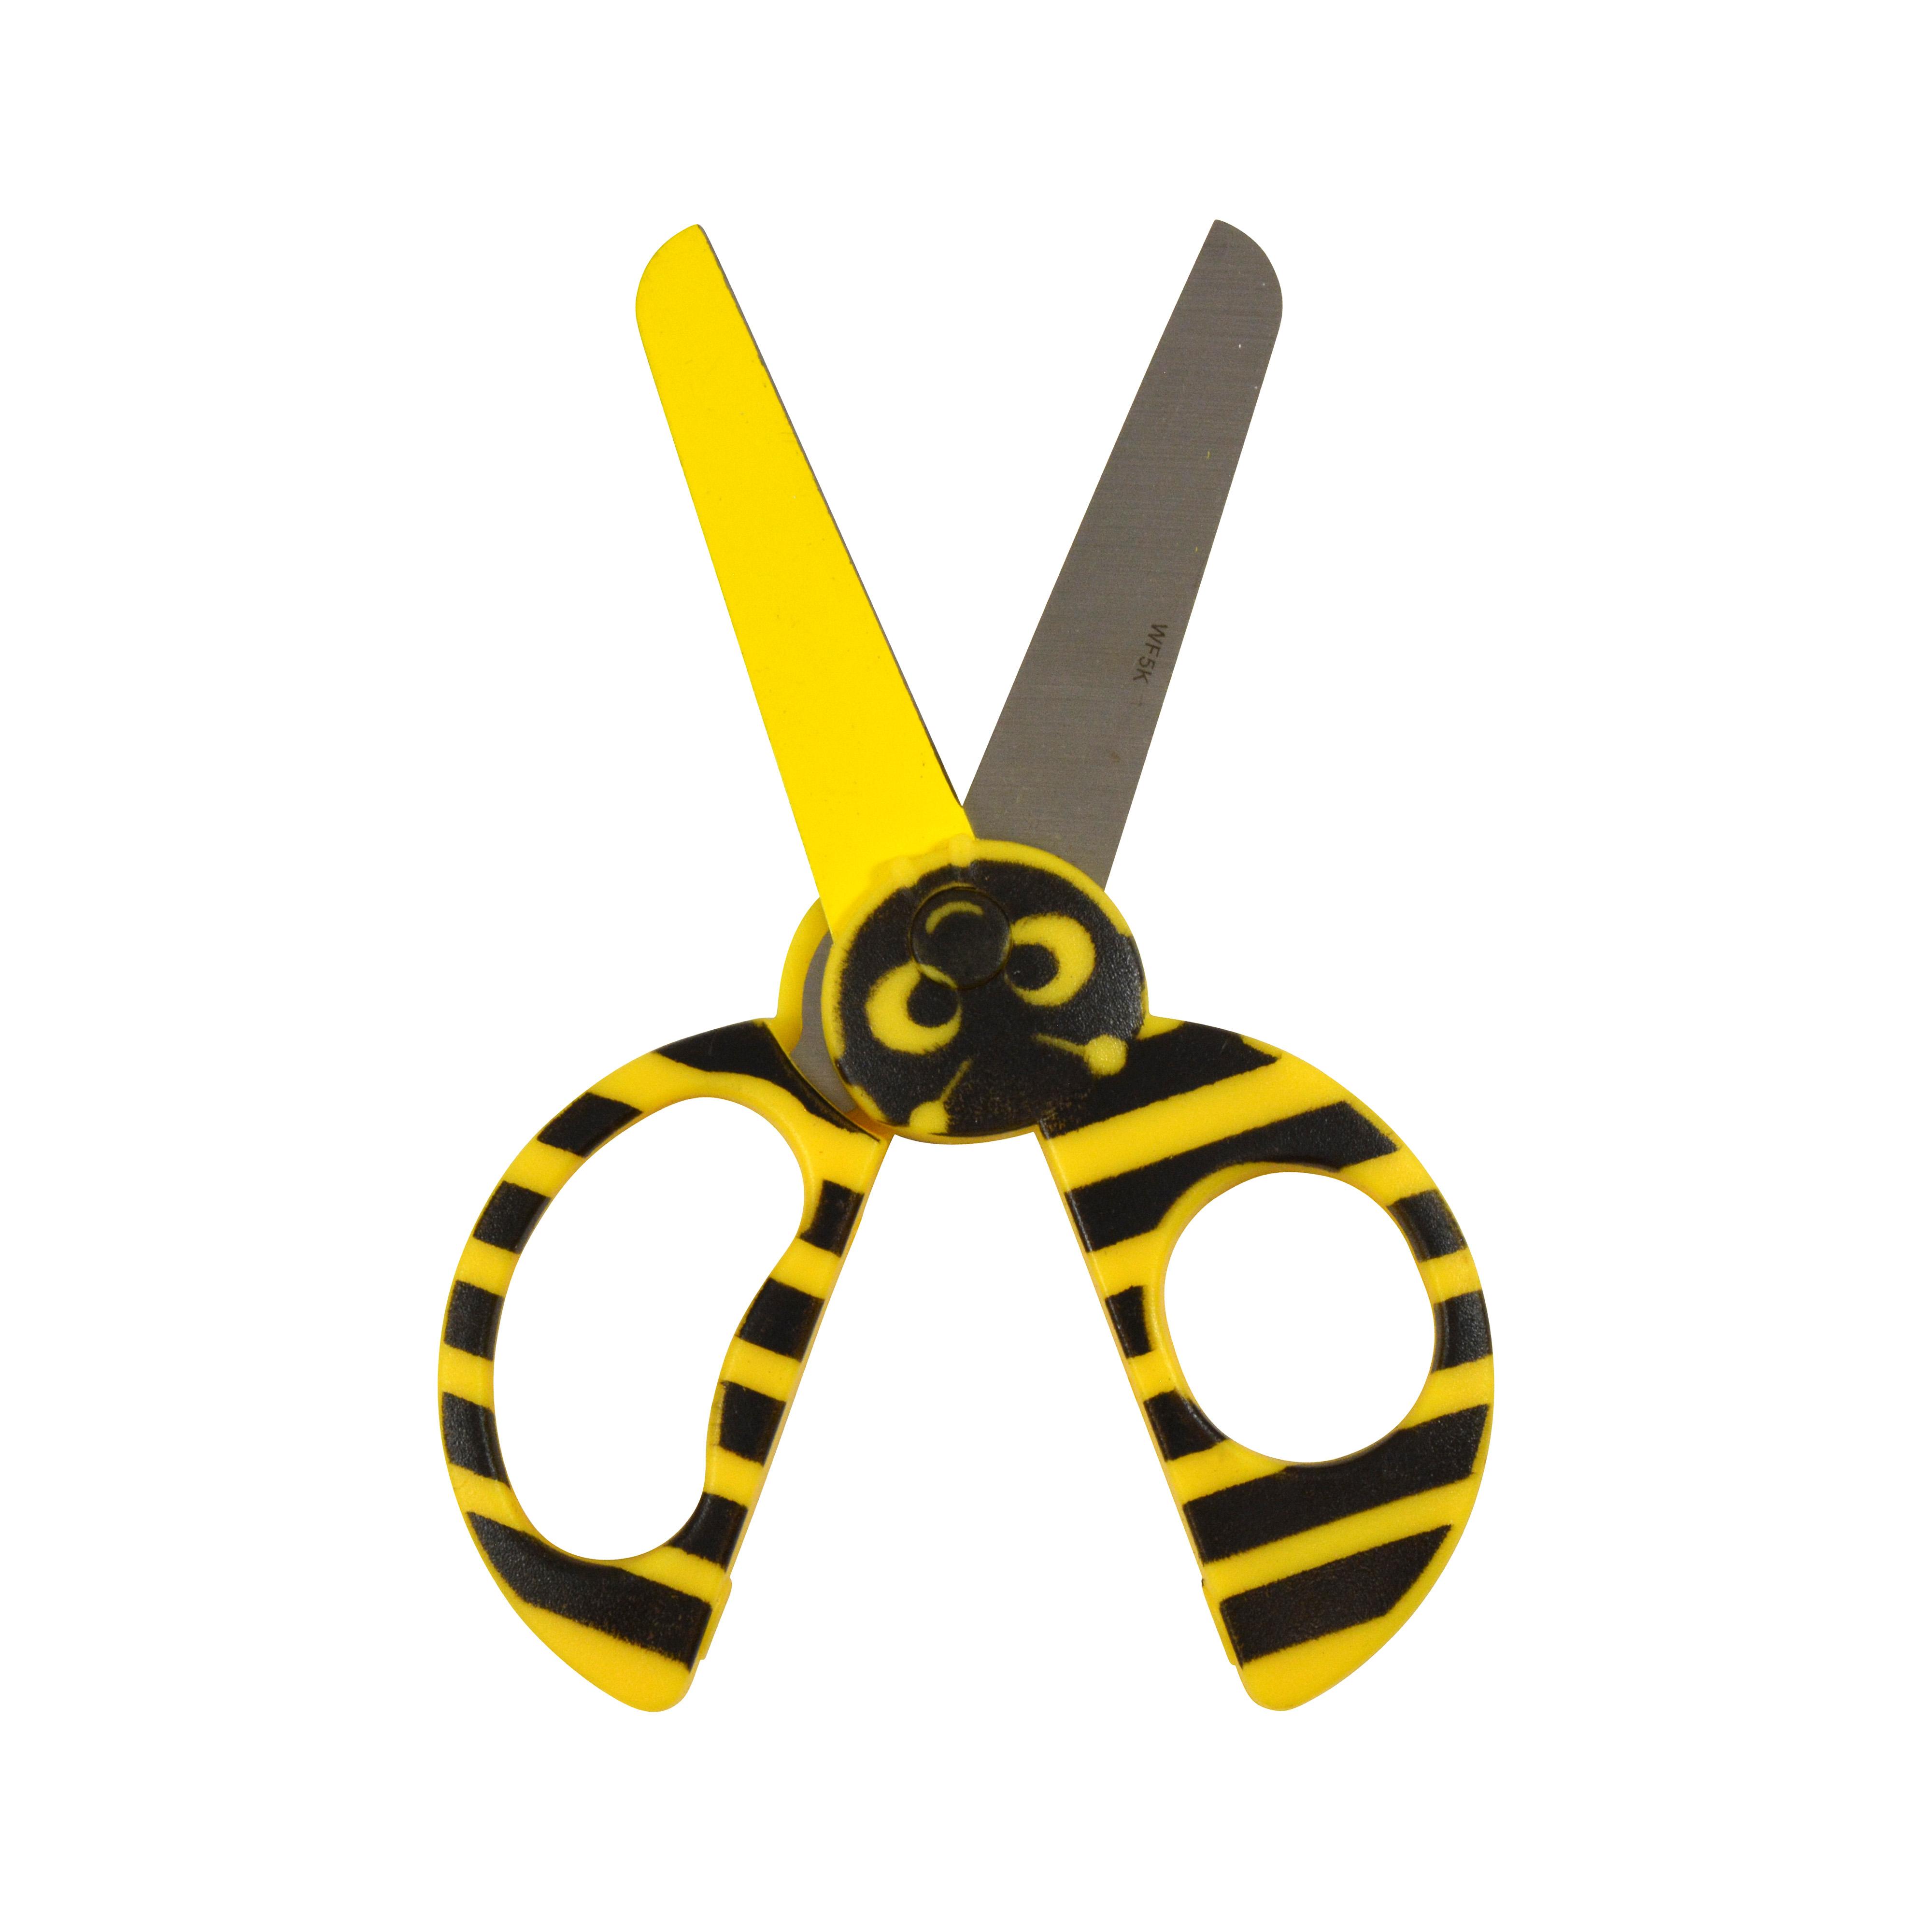 "Westcott Kids 5"" Critters Scissors, Bumble Bee (16208)"